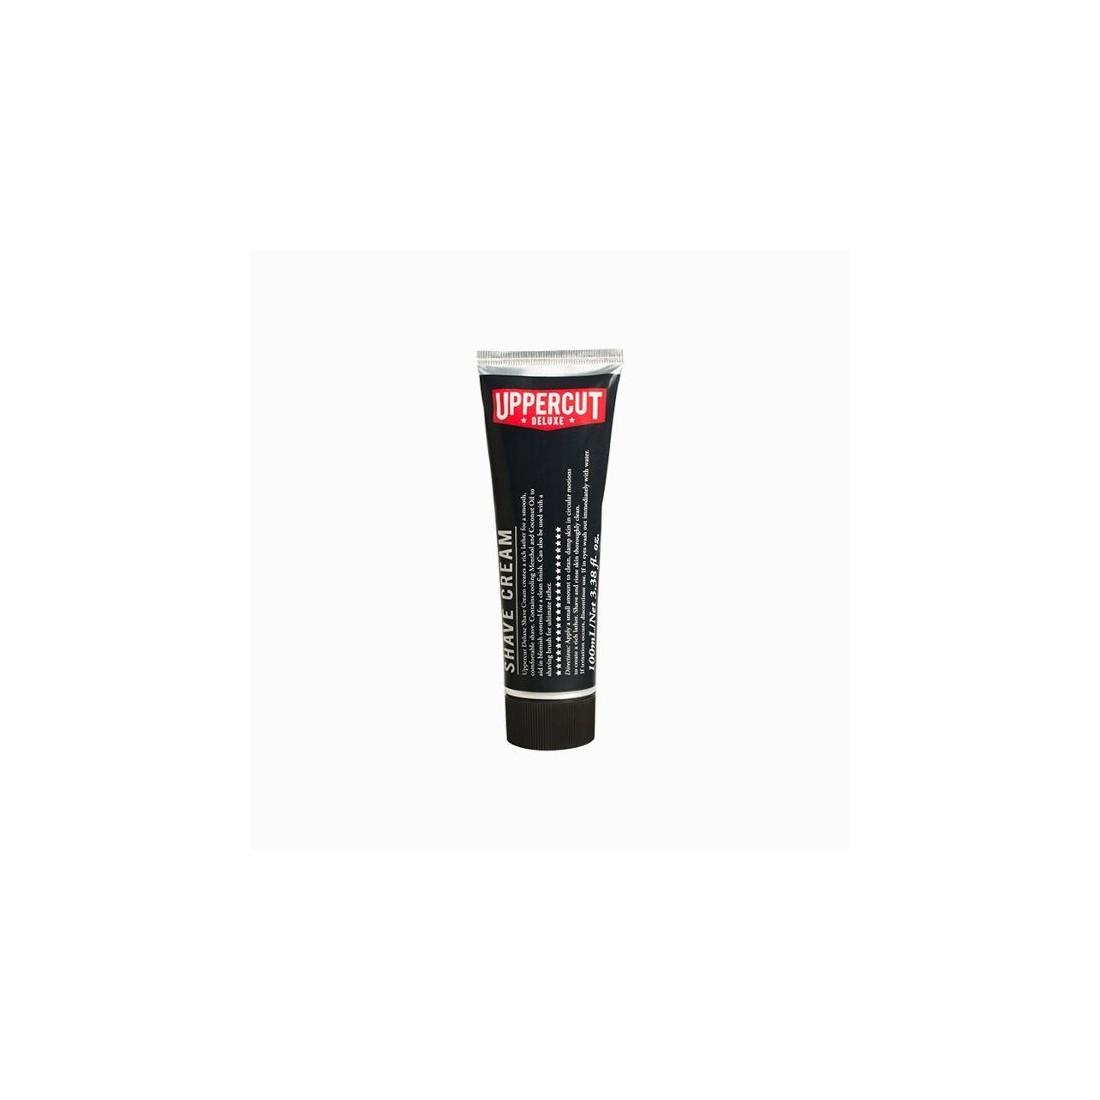 Uppercut Shaving Cream 100ml